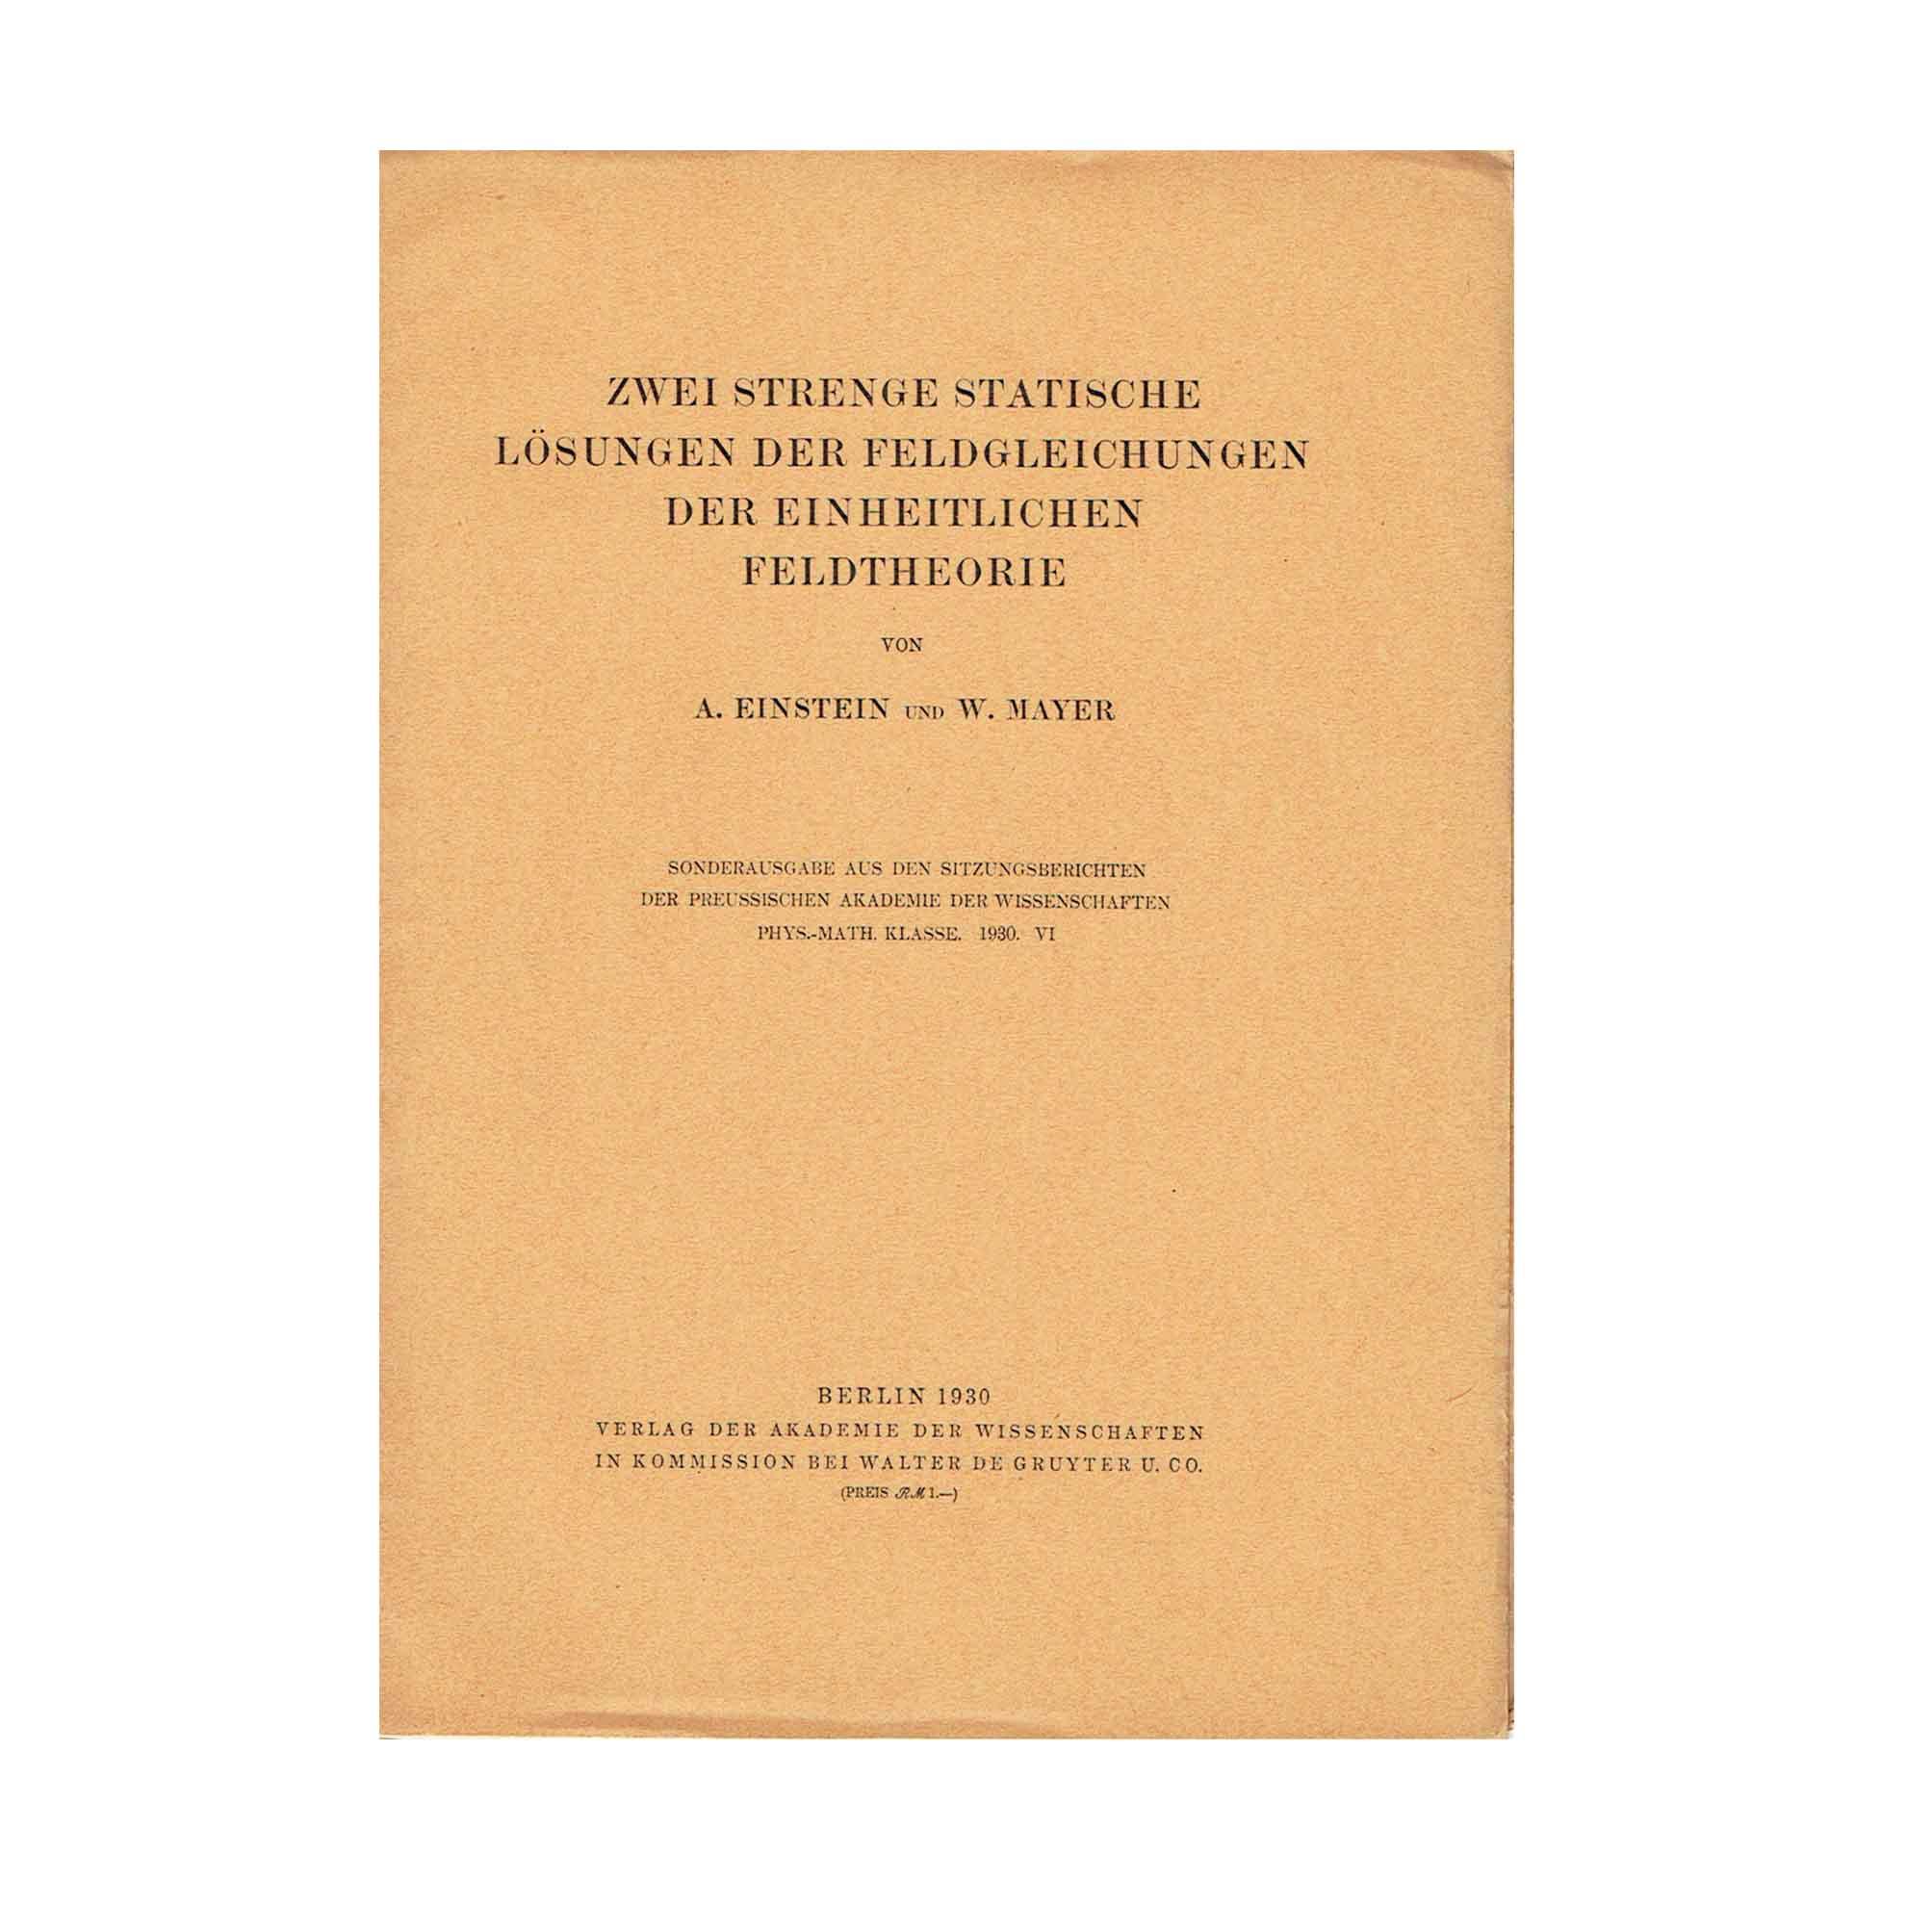 5742-Static-Solutions-Akademie-VI-1930-SA-Cover-recto-N.jpg